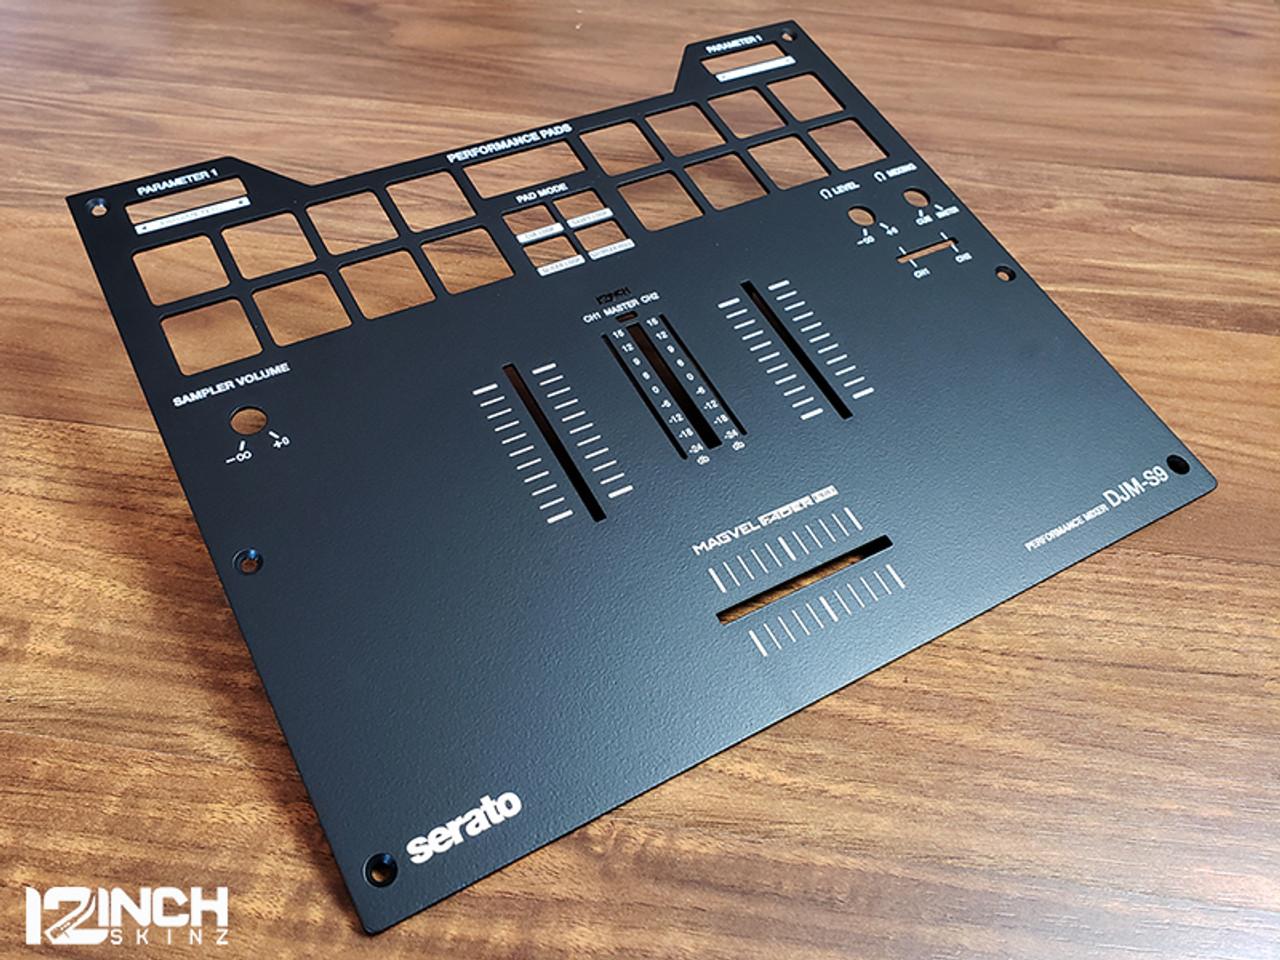 DJM-S9 Powder Coat Black Fader Plate